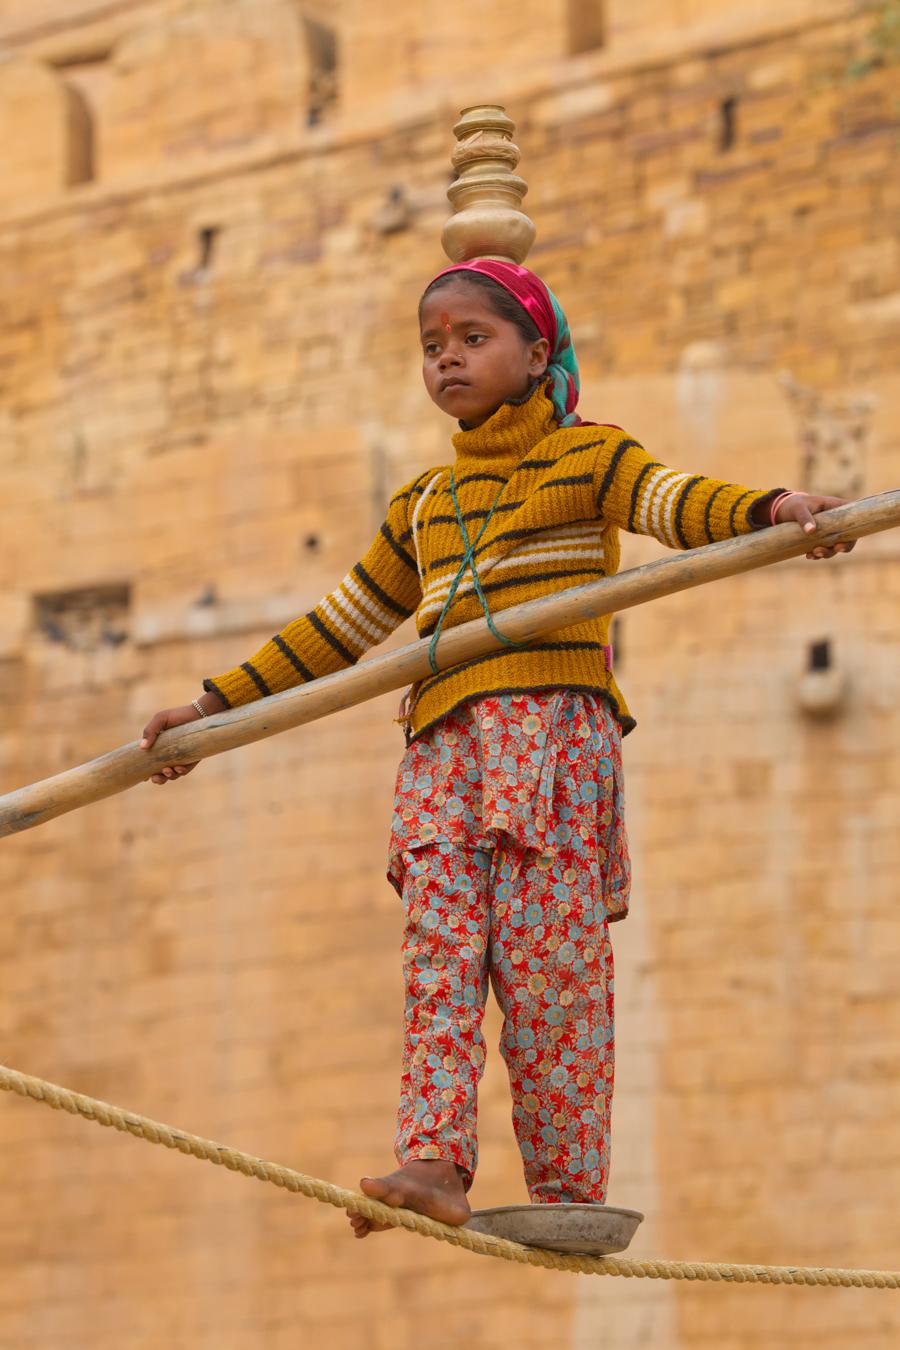 Tightrope walker, Jaisalmer, Rajasthan, Feb 2013